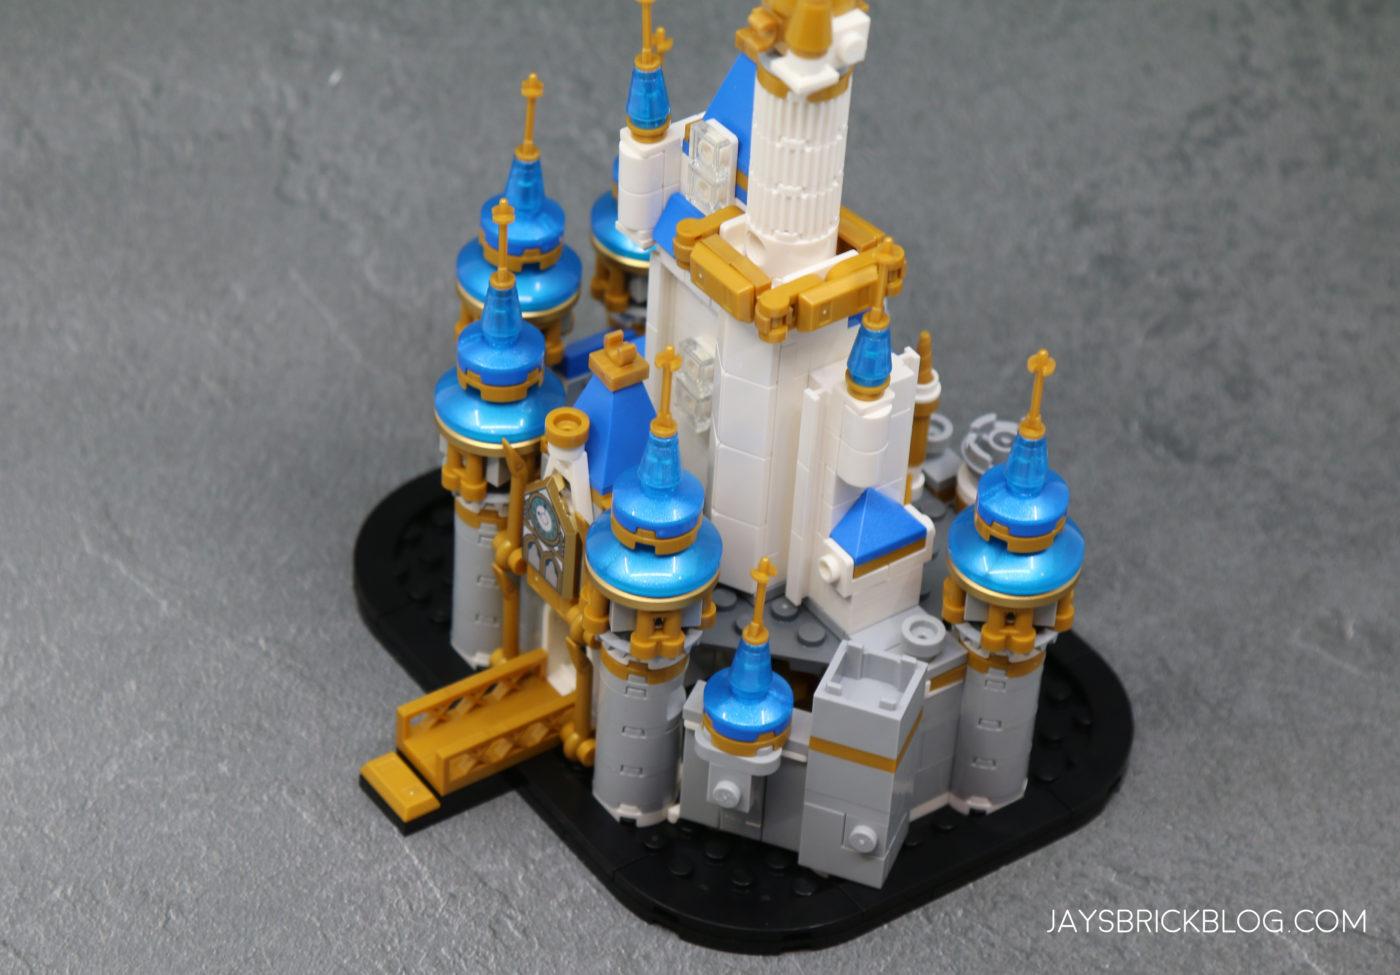 LEGO 40478 Mini Disney Castle Top View